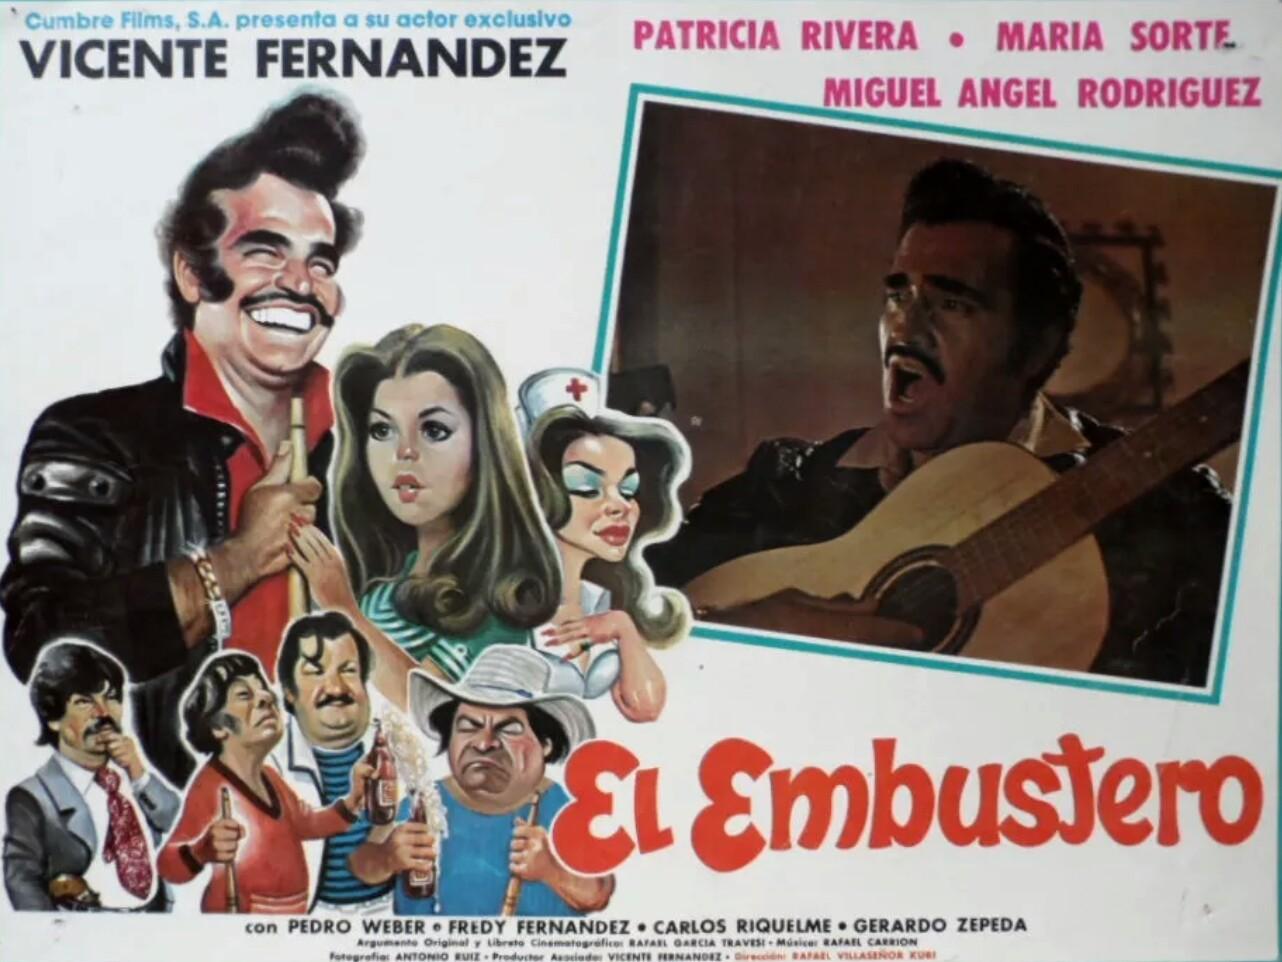 Freddy Fernández, Vicente Fernández, Patricia Rivera, Miguel Ángel Rodríguez, María Sorté, and Pedro Weber 'Chatanuga' at an event for El embustero (1985)